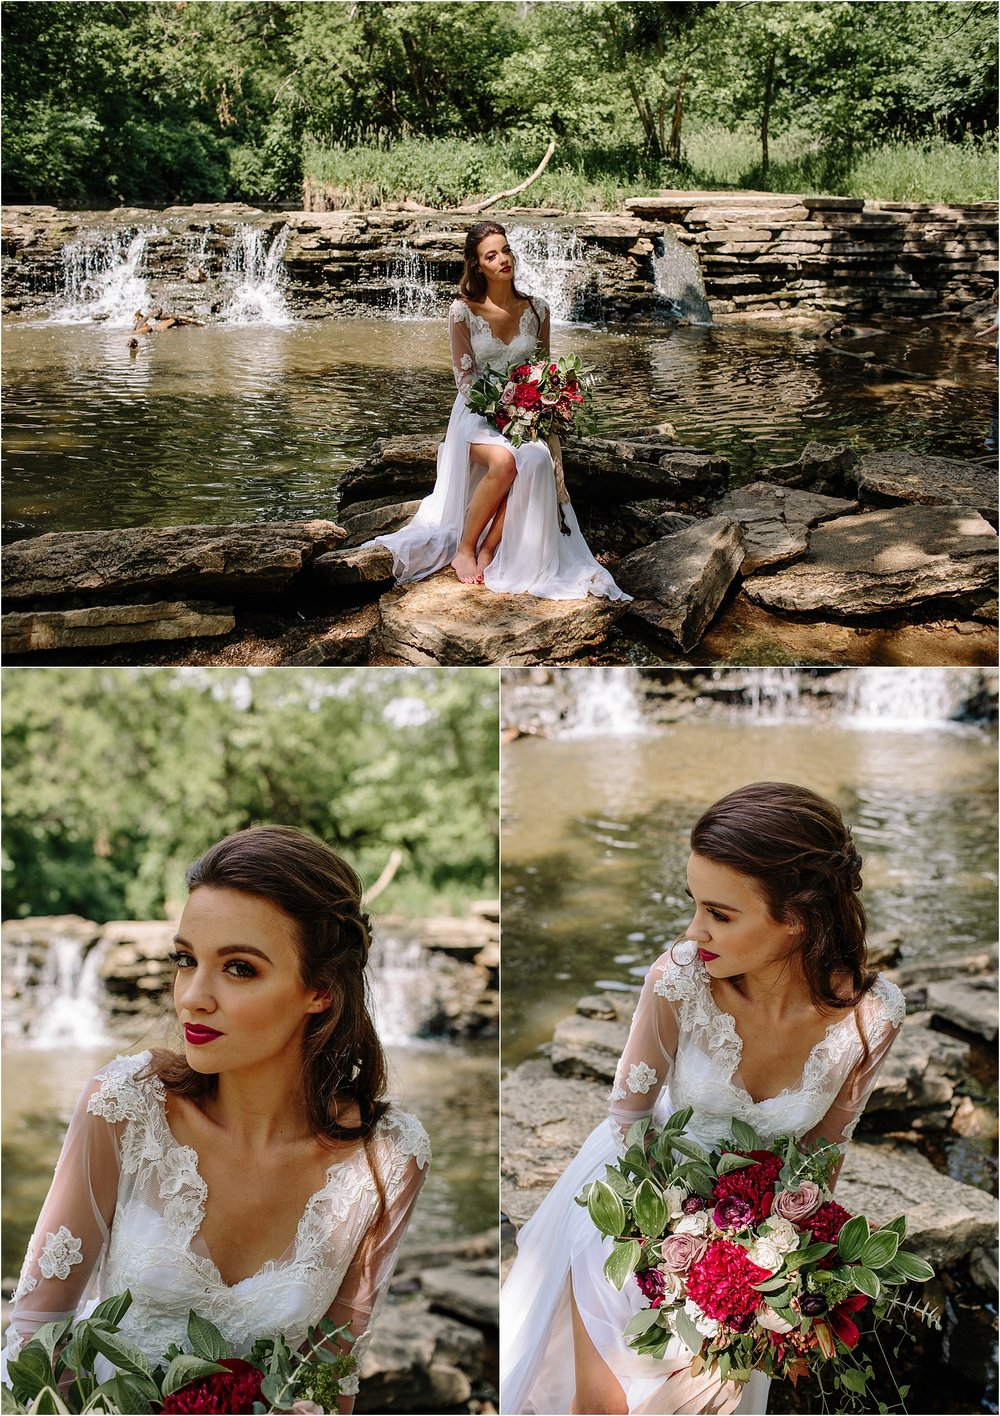 waterfall-glen-wedding-lemont-il-7.jpg